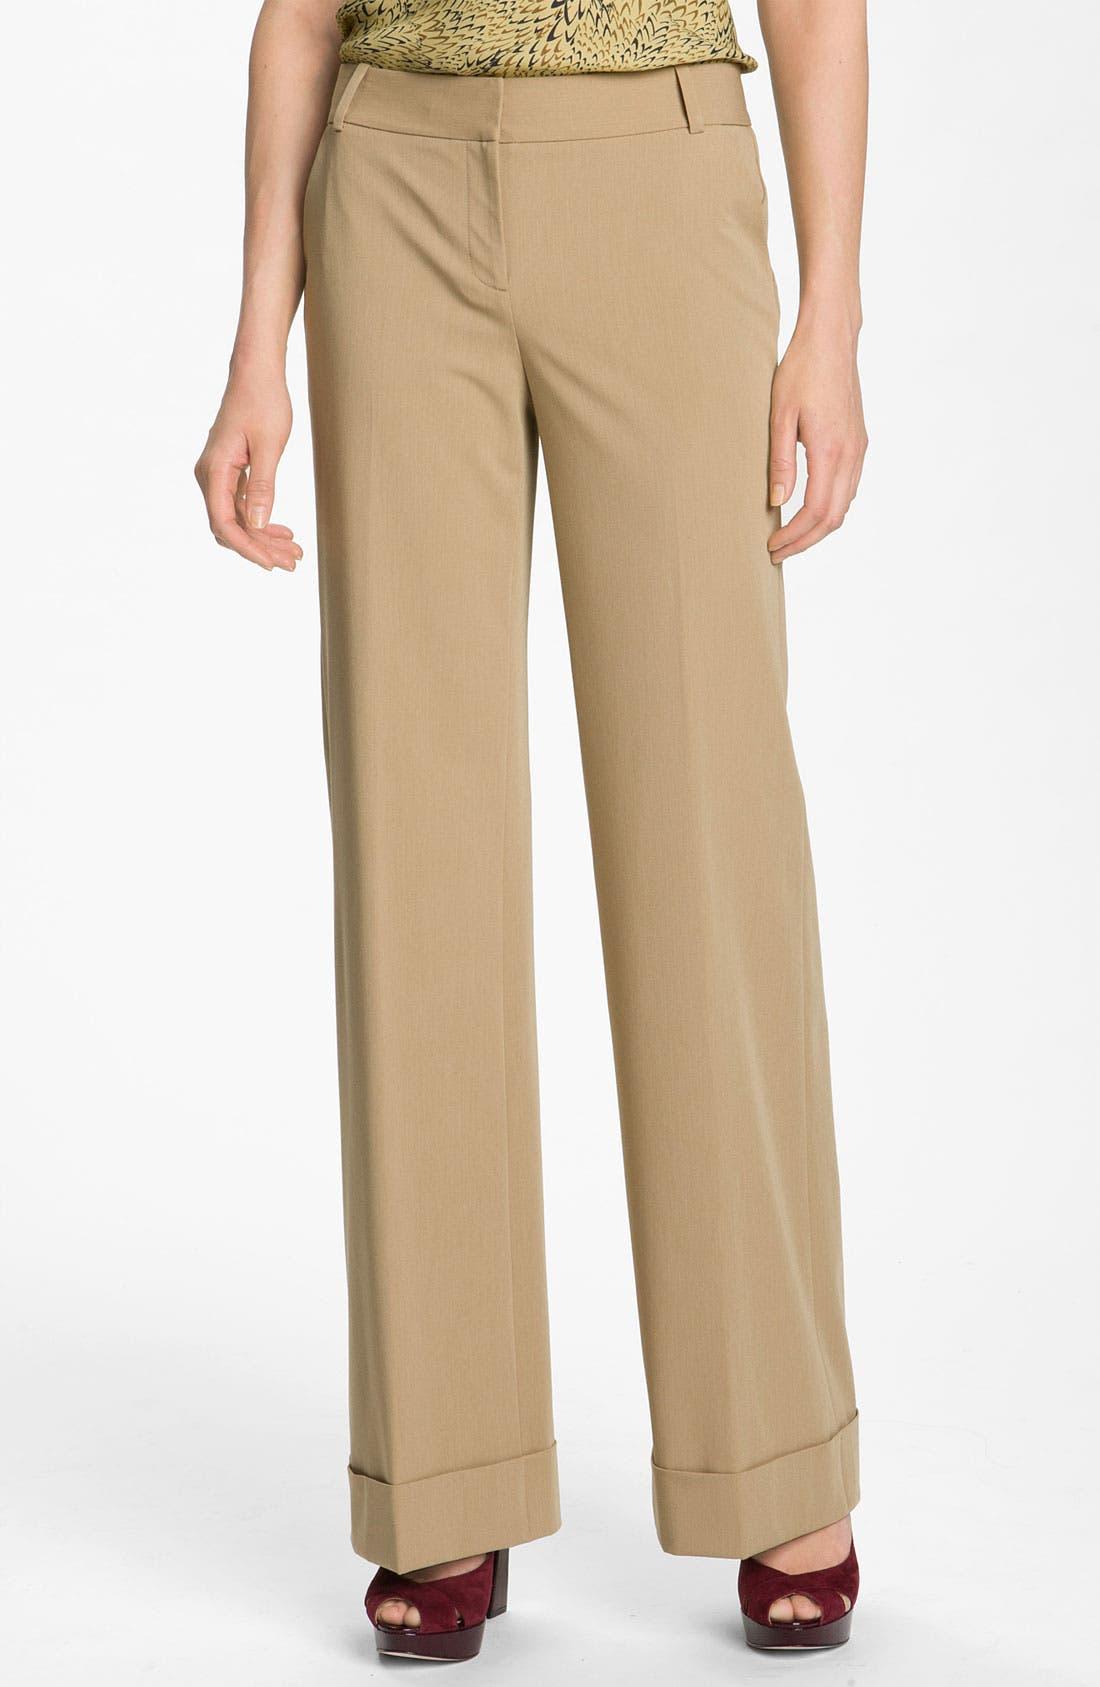 Main Image - Classiques Entier® 'Maxella' Cuff Pants